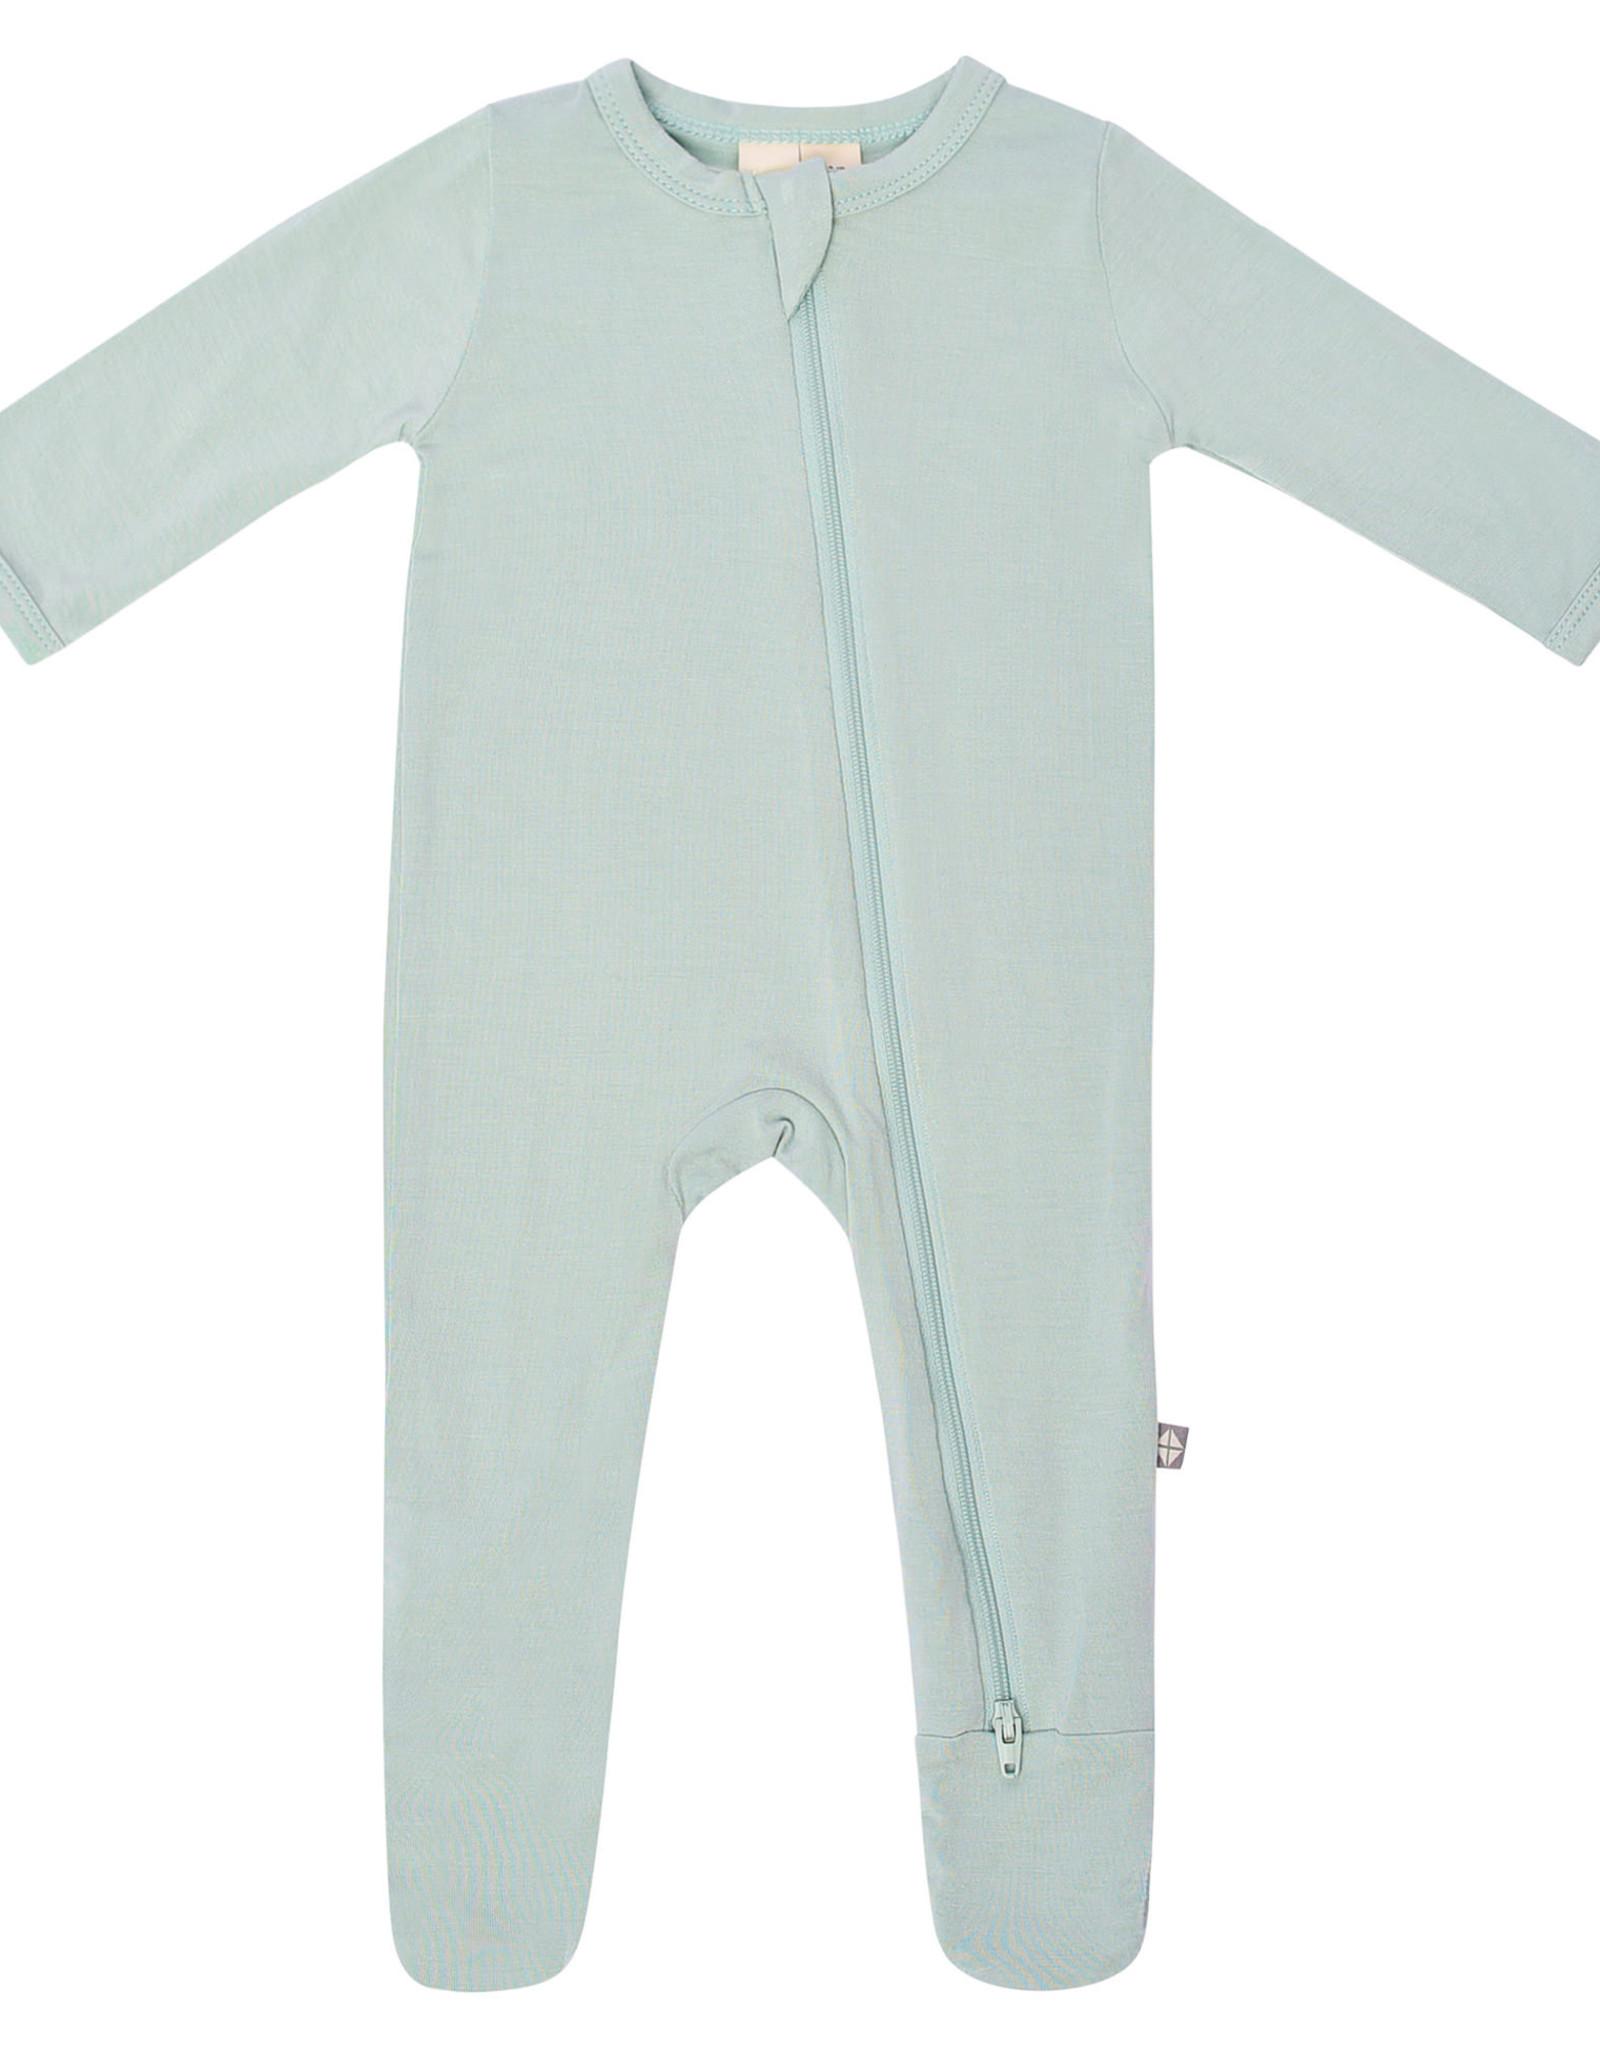 Kyte Baby zippered footie- sage